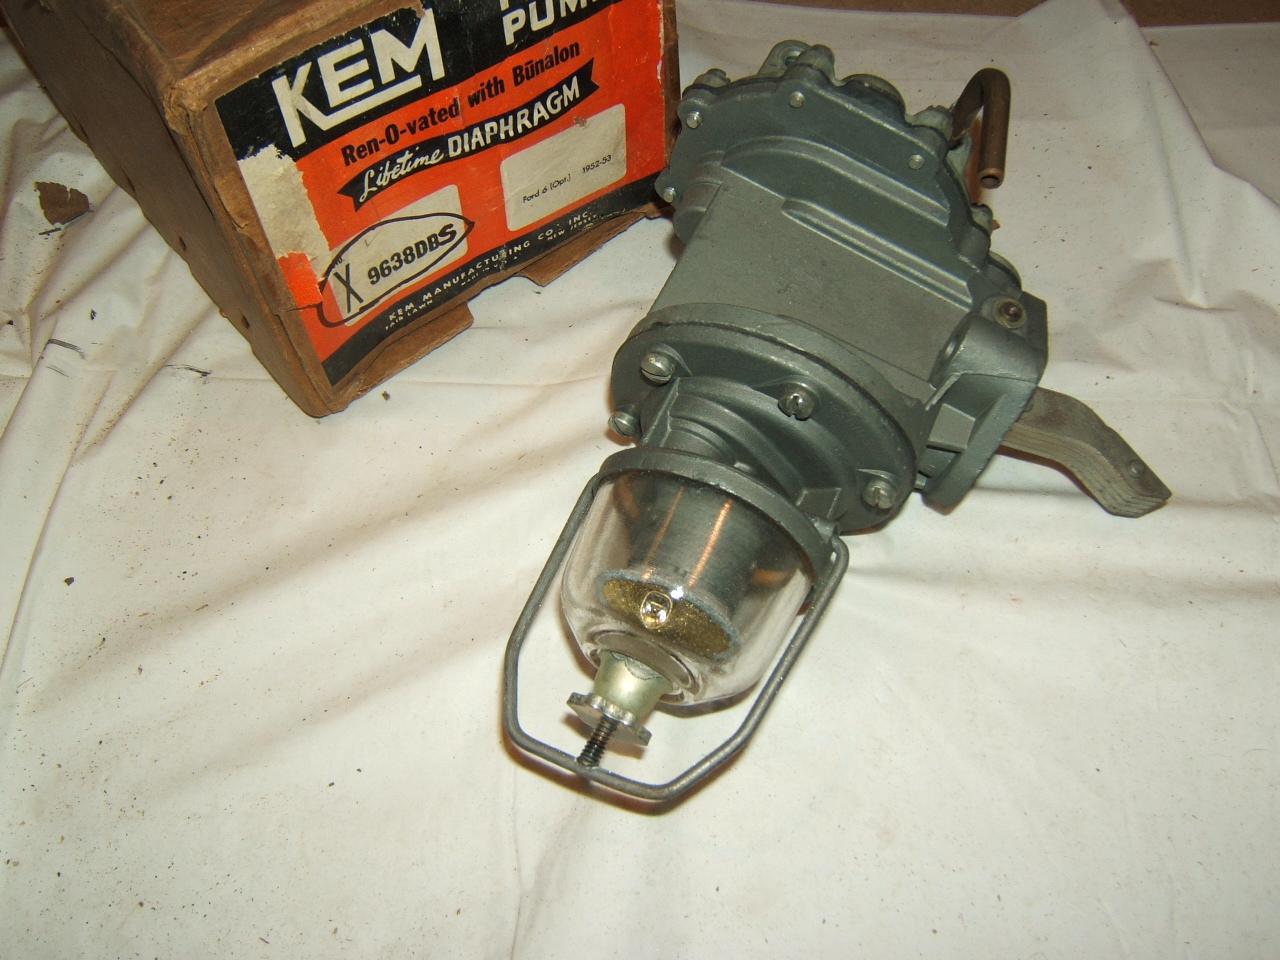 1952 1953 Ford / Pickup 6dual action fuel pump reman #9638 (a9638ds rblt)